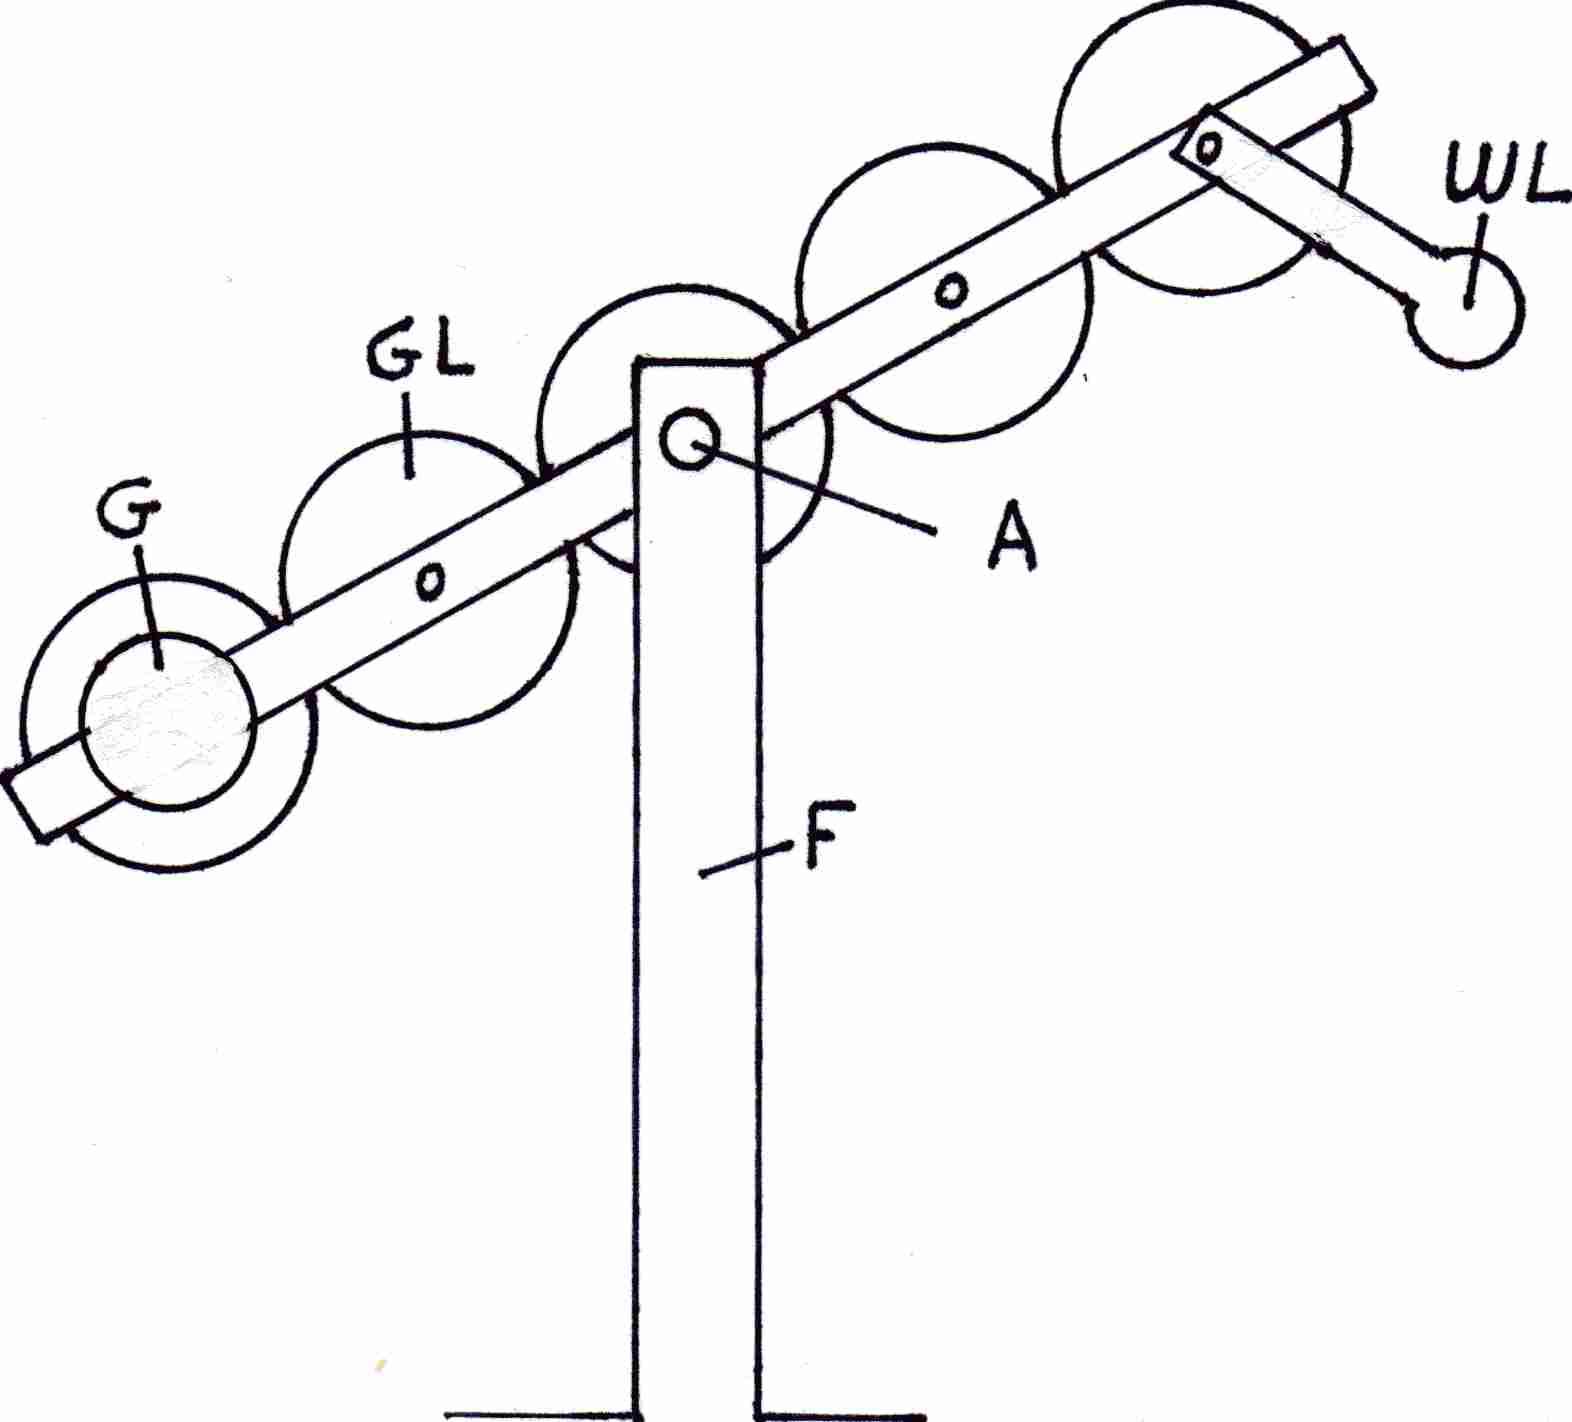 gearbalancexle,rame,enerator,gearedlinkage,weightedlevercounterweightaddedforbalance,allthegearlinkagesfreerunningontherotatingframe